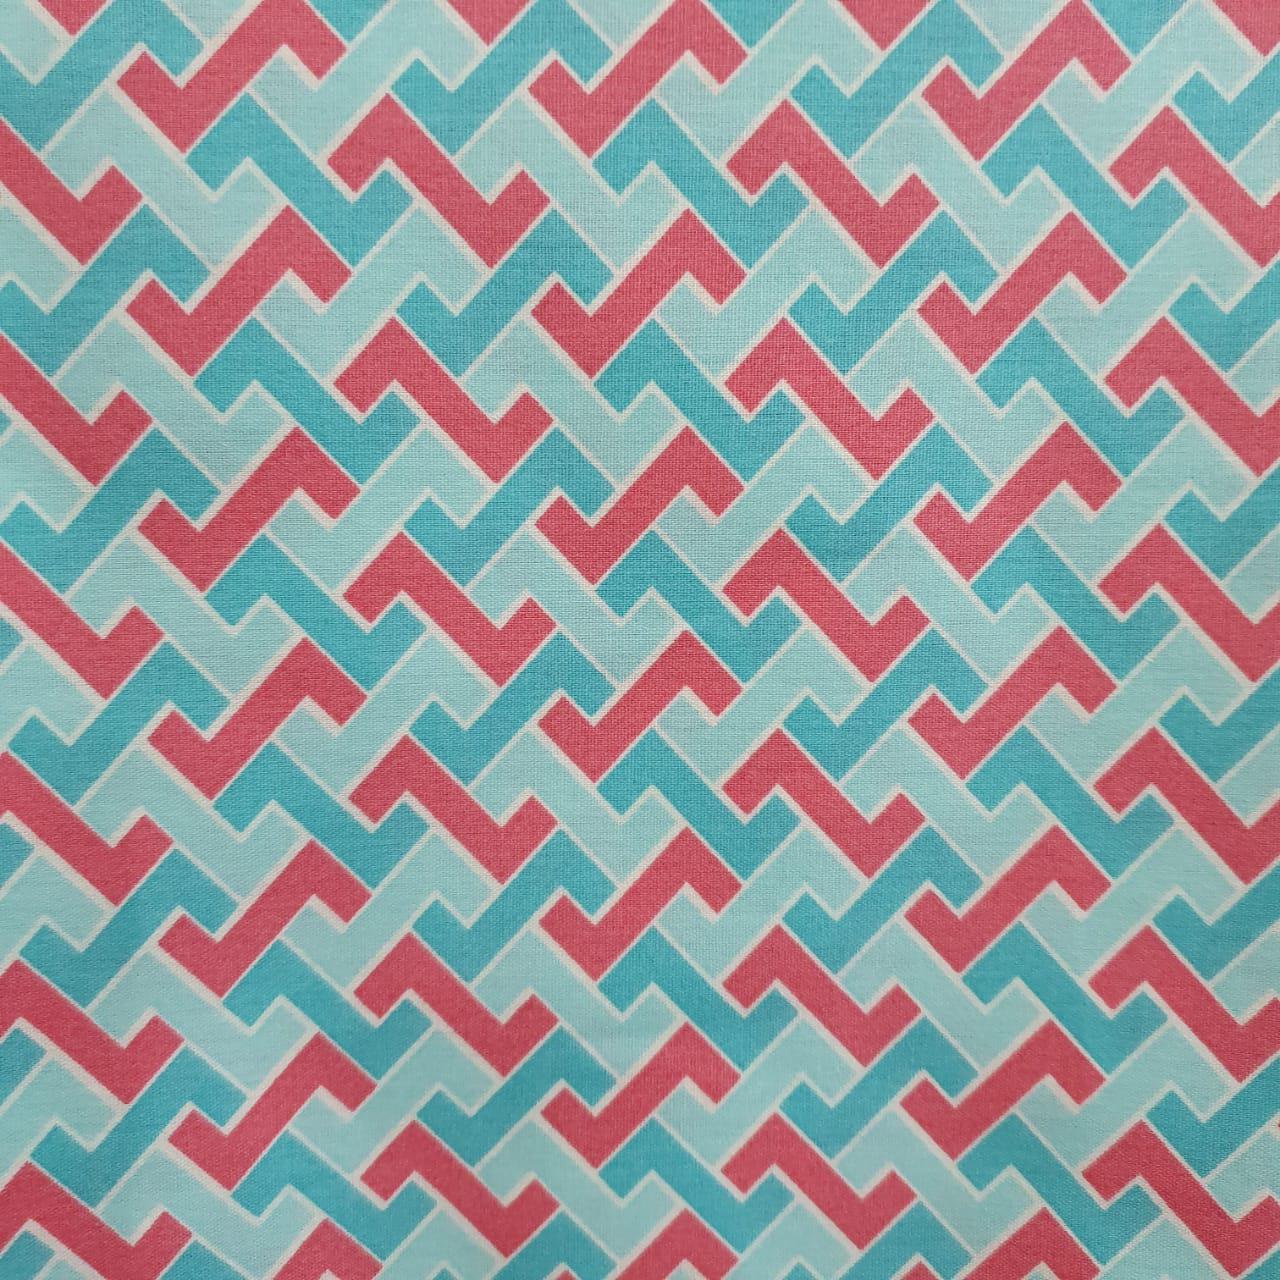 Tecido Tricoline Tetris Tiffany